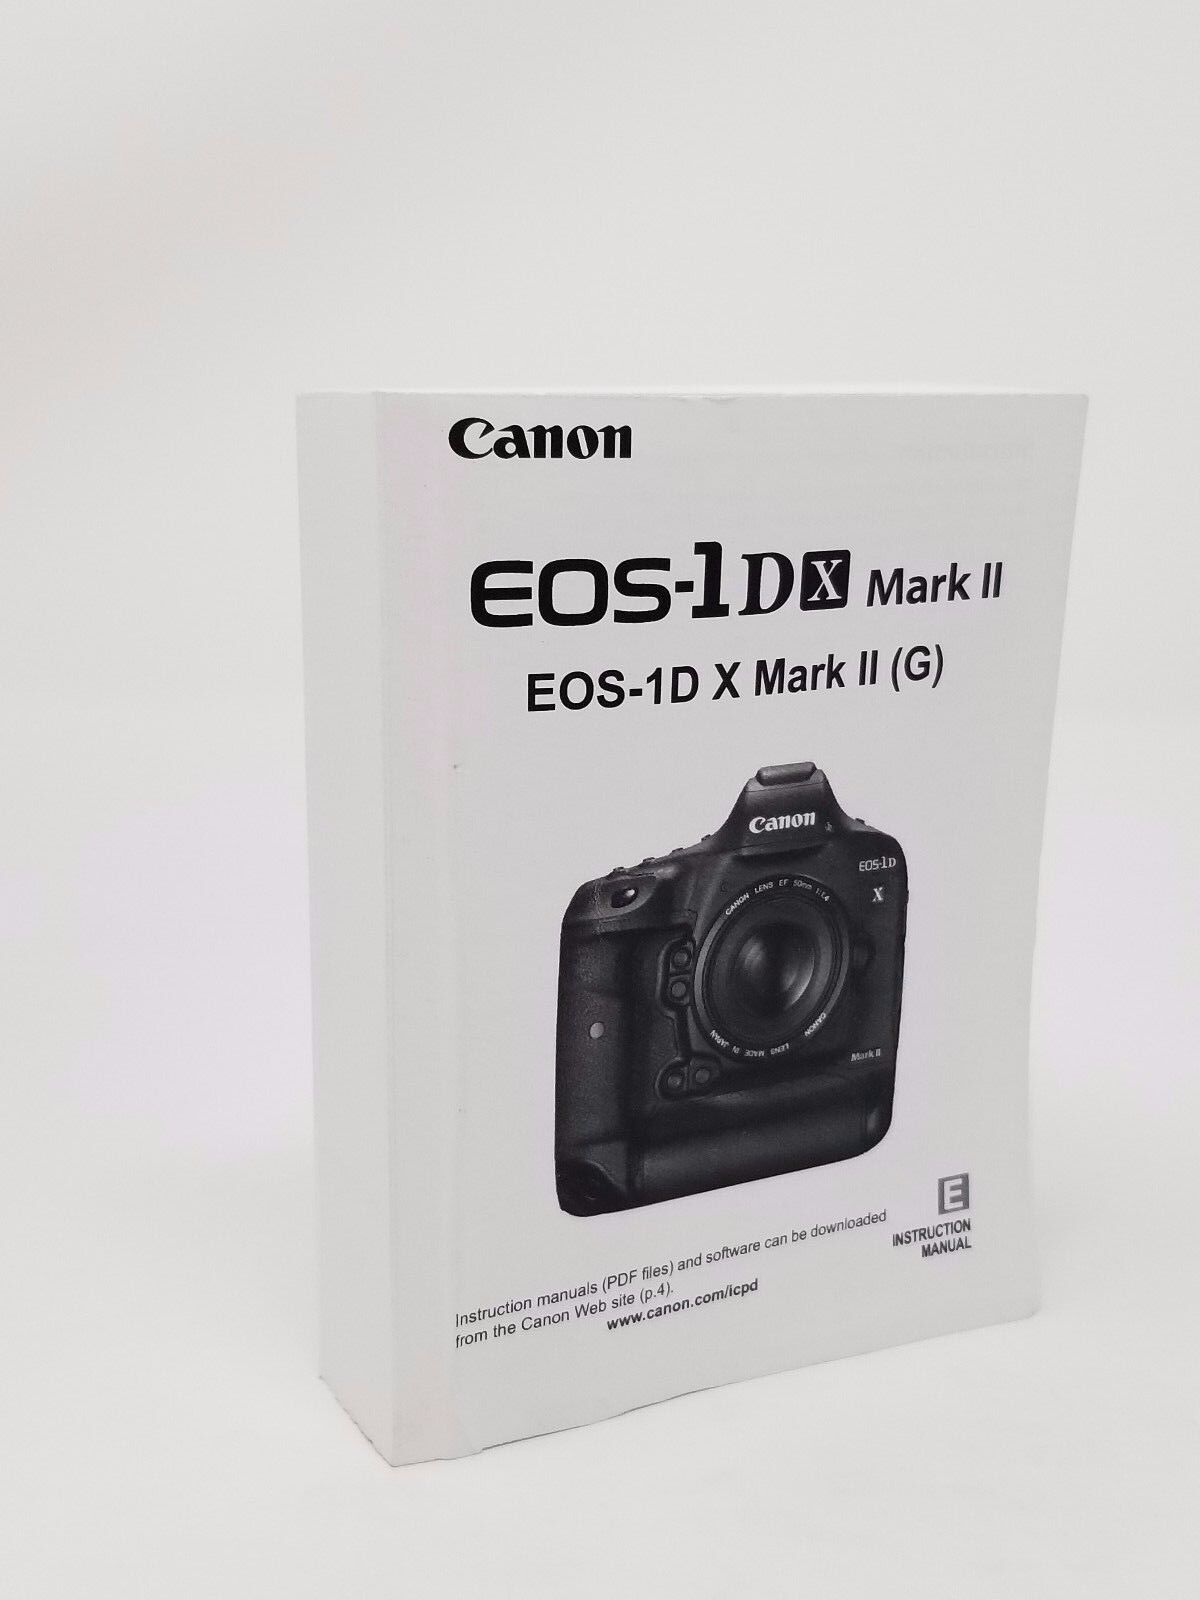 canon eos 1dx mark ii genuine instruction owners manual book rh bayshop com canon eos 1d mark iv instruction manual canon eos 1d mark ii instruction manual